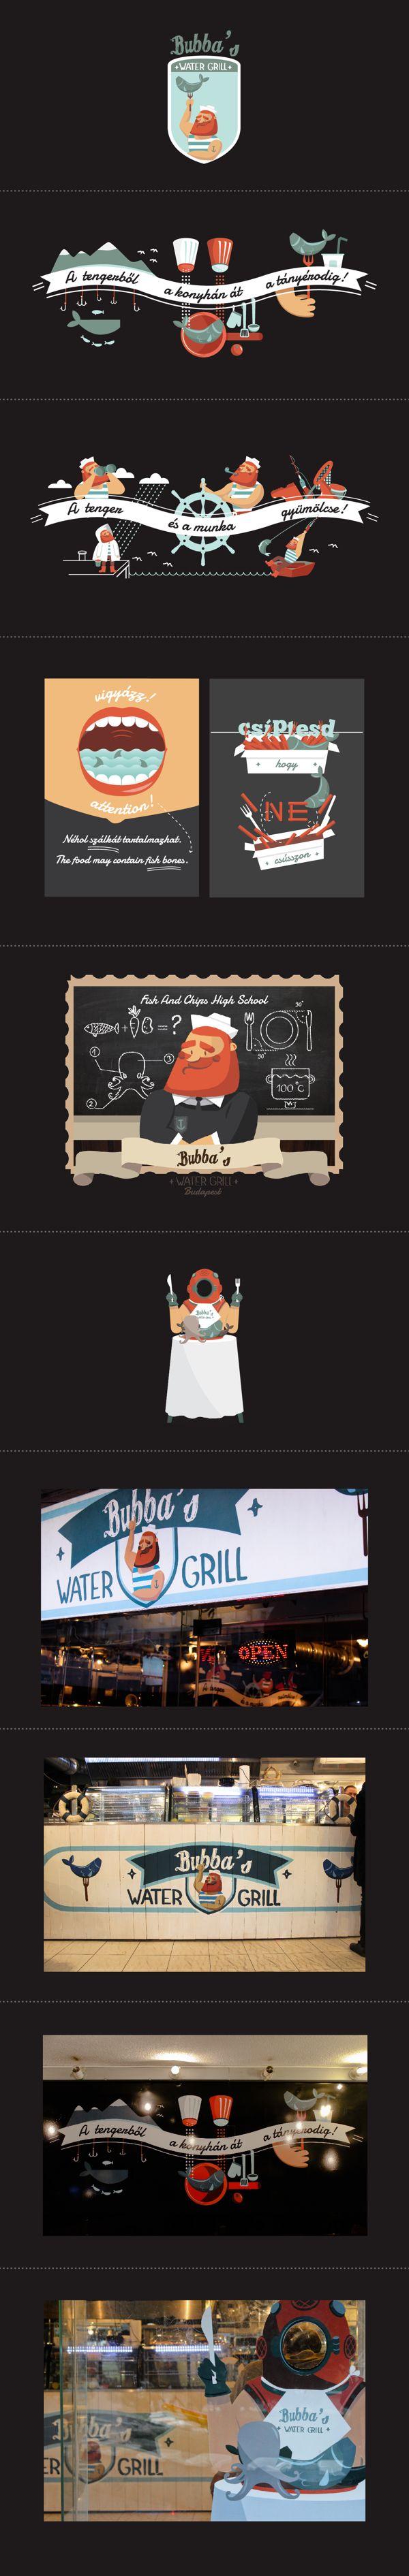 Bubba's Water Grill by Regina Szabó, via Behance